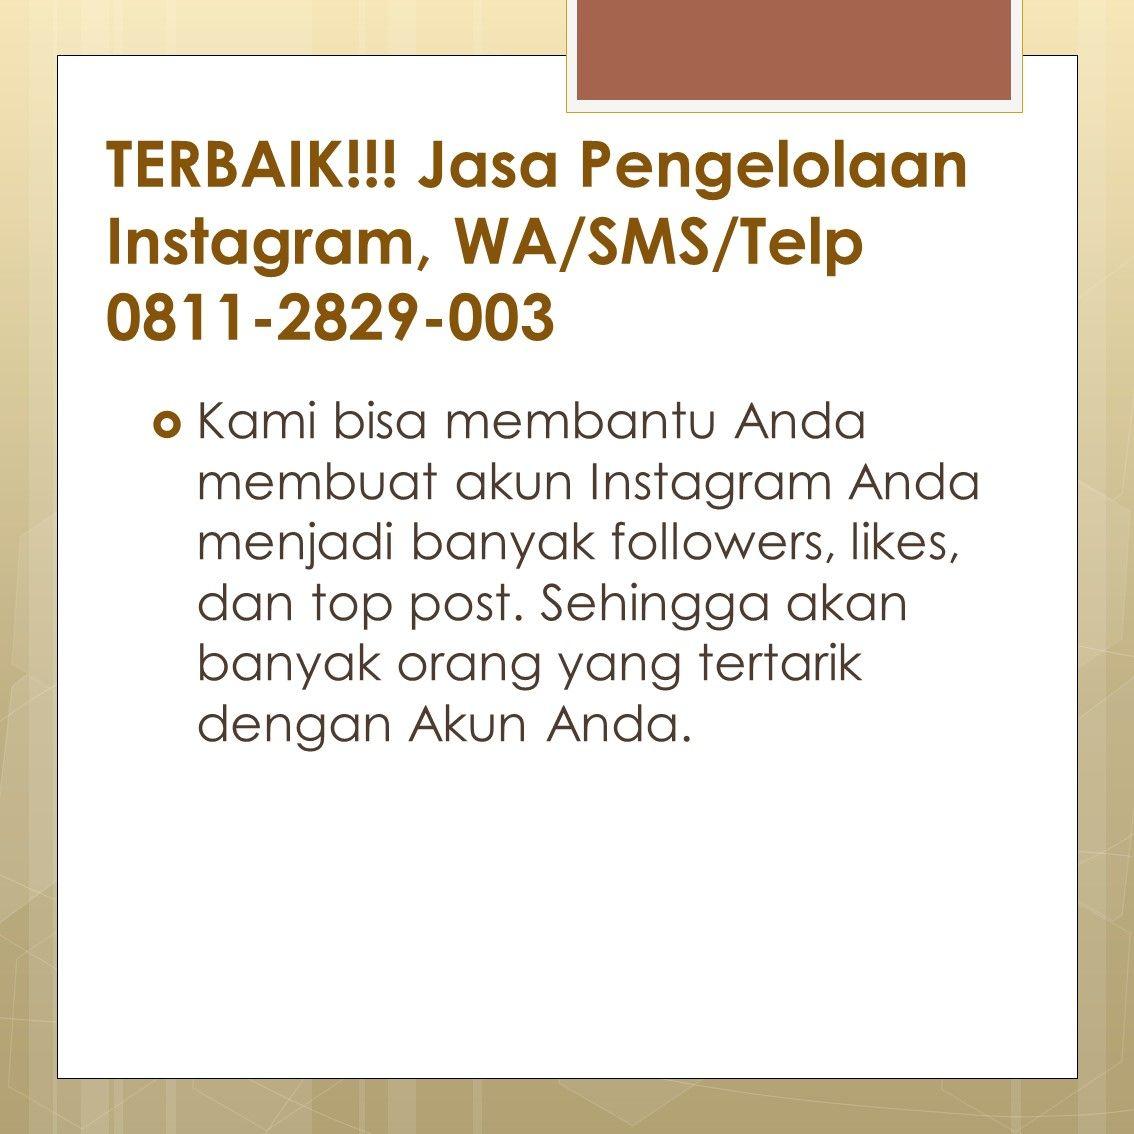 Terbaik Jasa Pengelolaan Instagram Wa Sms Telp 0811 2829 003 Jasa Pengelolaan Instagram Merupakan Jasa Yang Membantu Mengelola Instagram Anda Instagram Sms